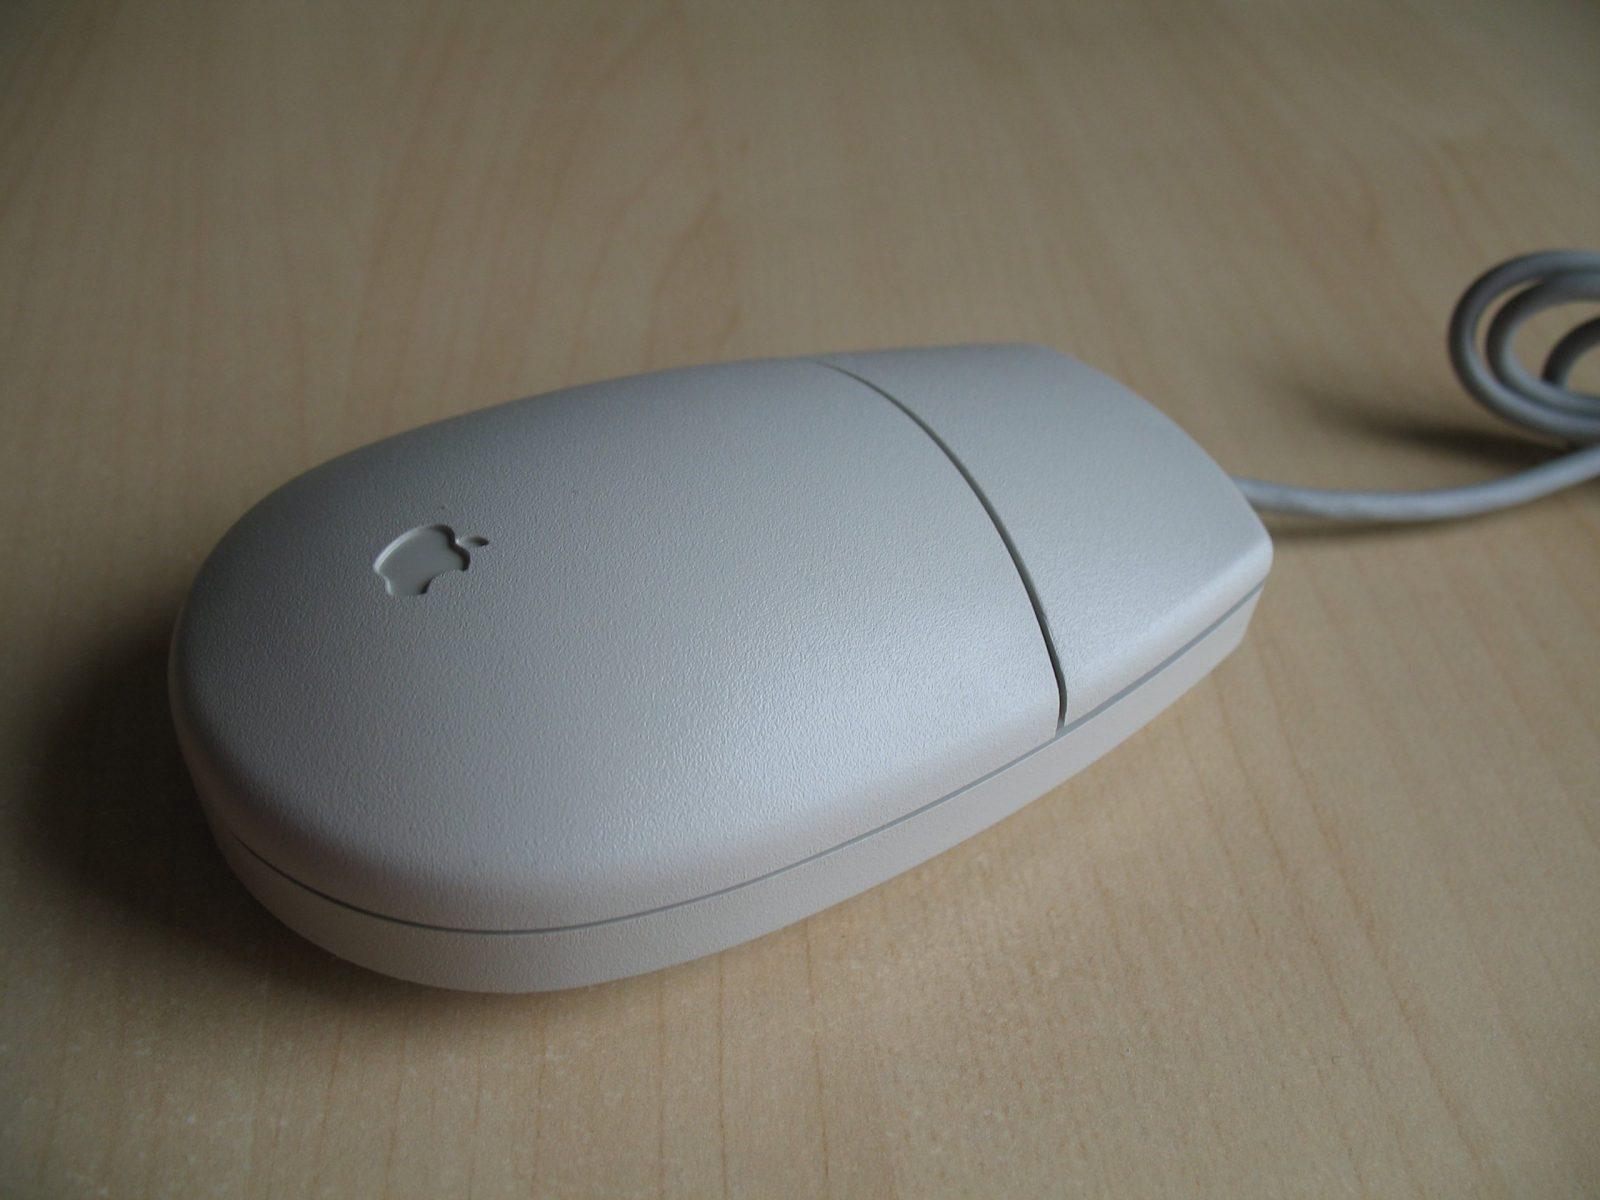 Однокнопочная мышка от Apple